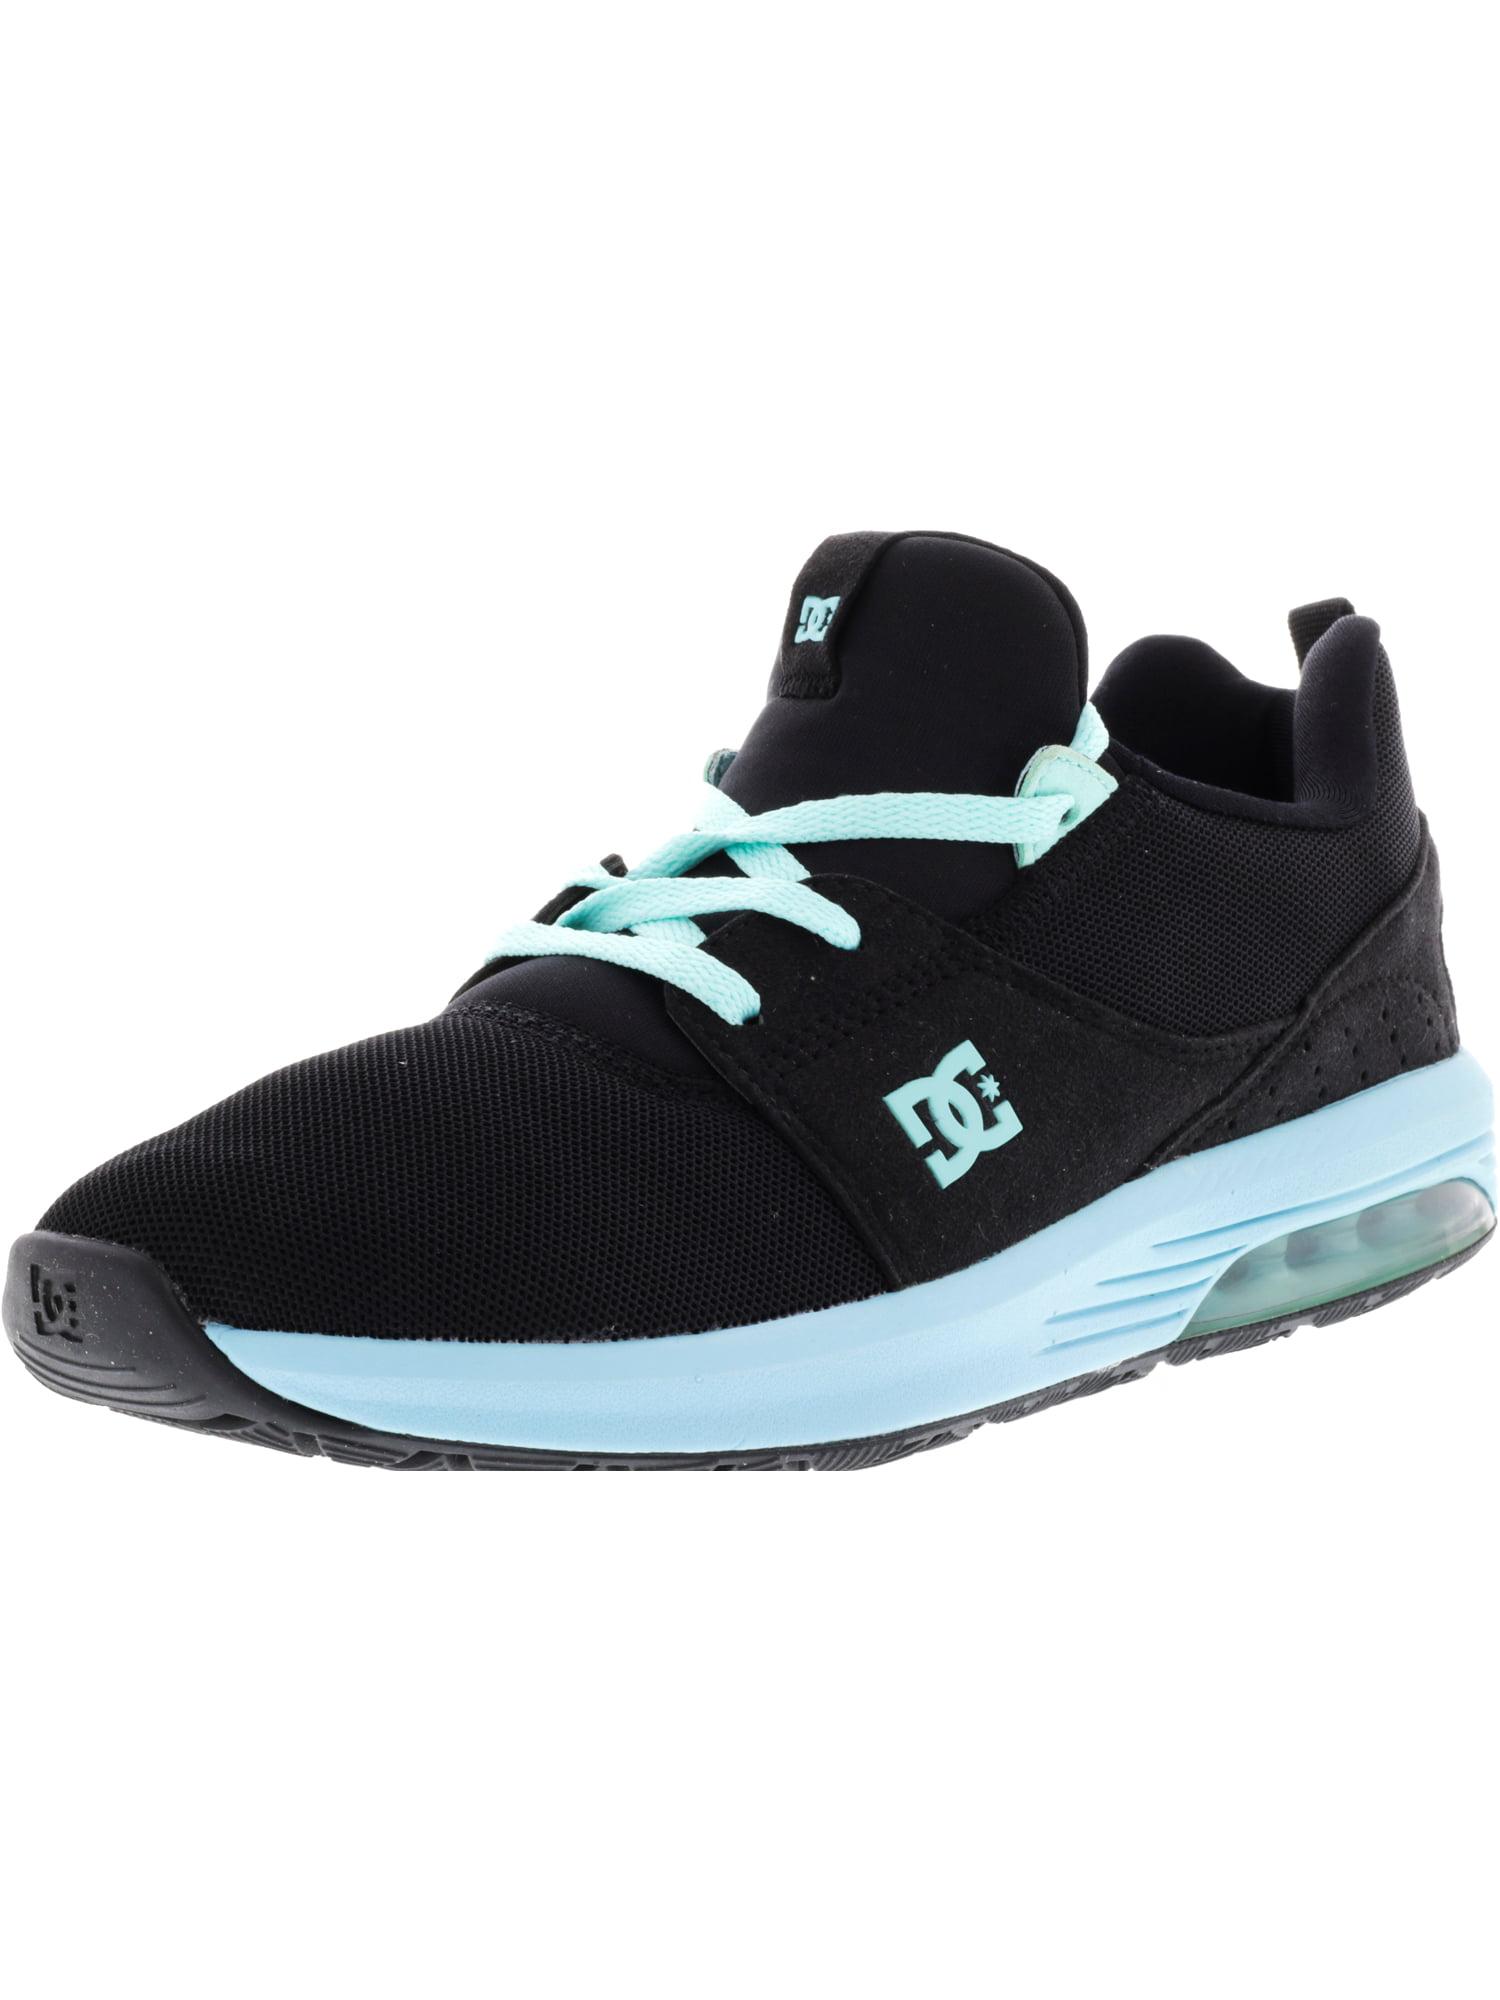 Dc Women s Heathrow Ia Black   Aqua Ankle-High Skateboarding Shoe 8fa7fe1bf7